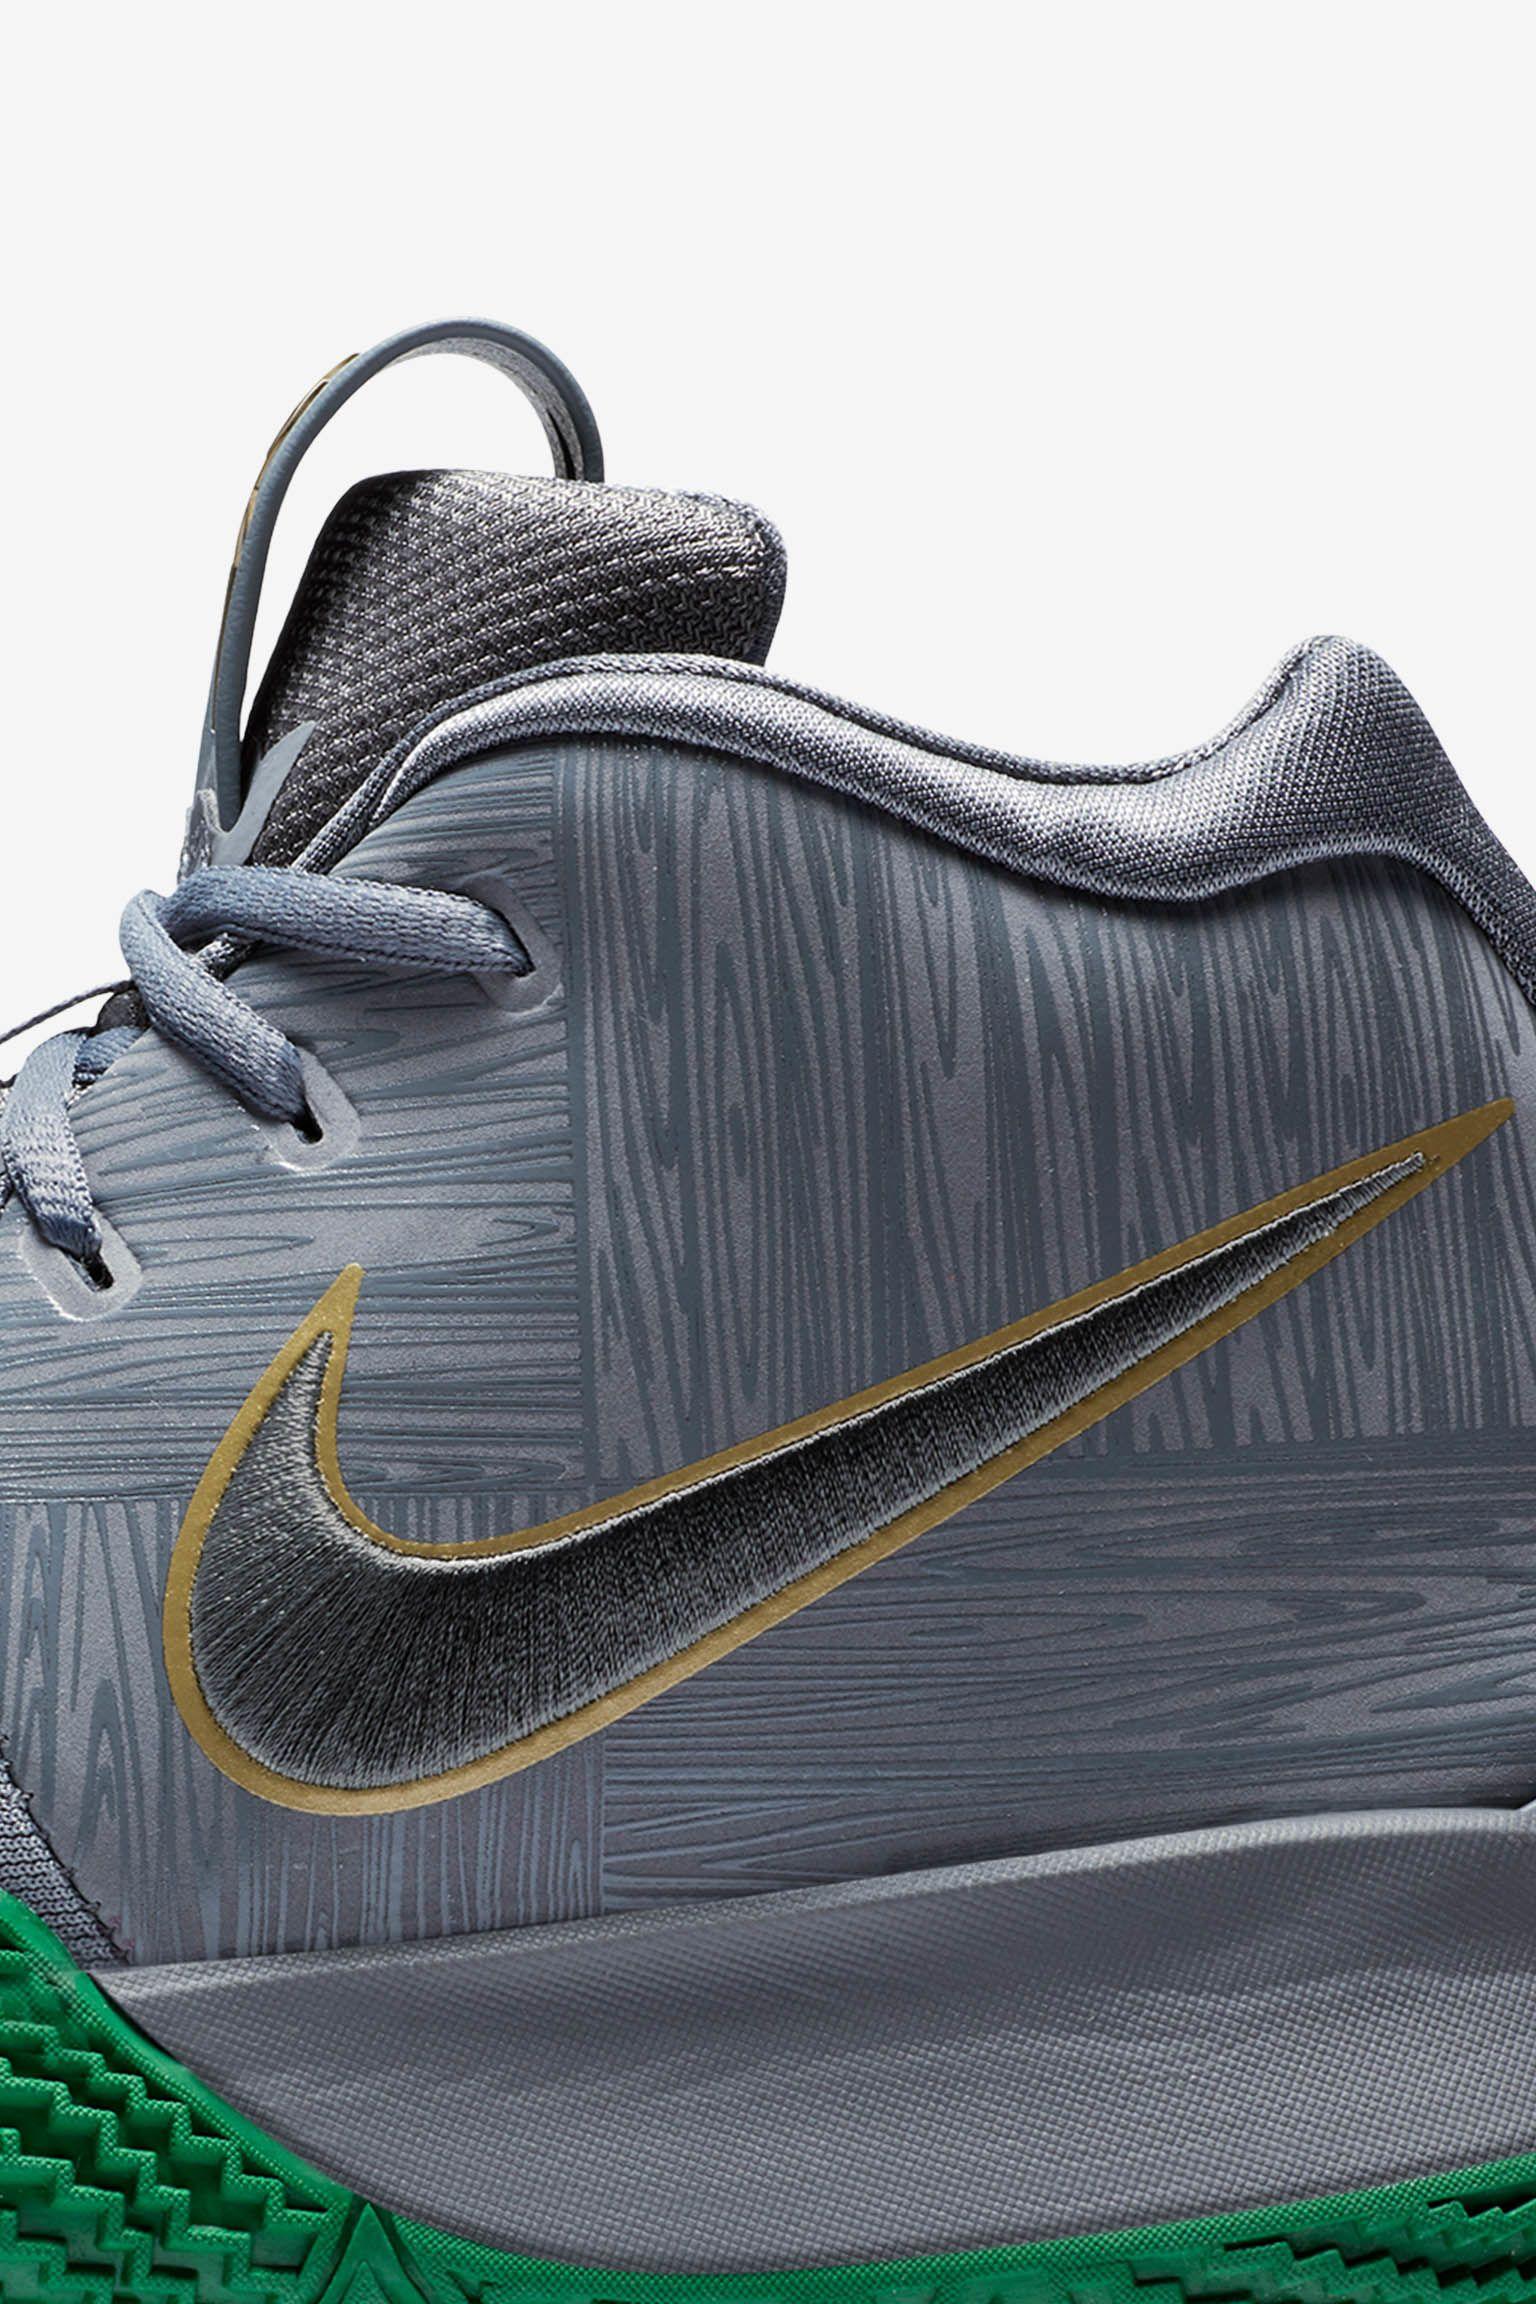 Nike Kyrie 4 'Parquet Legends' Release Date